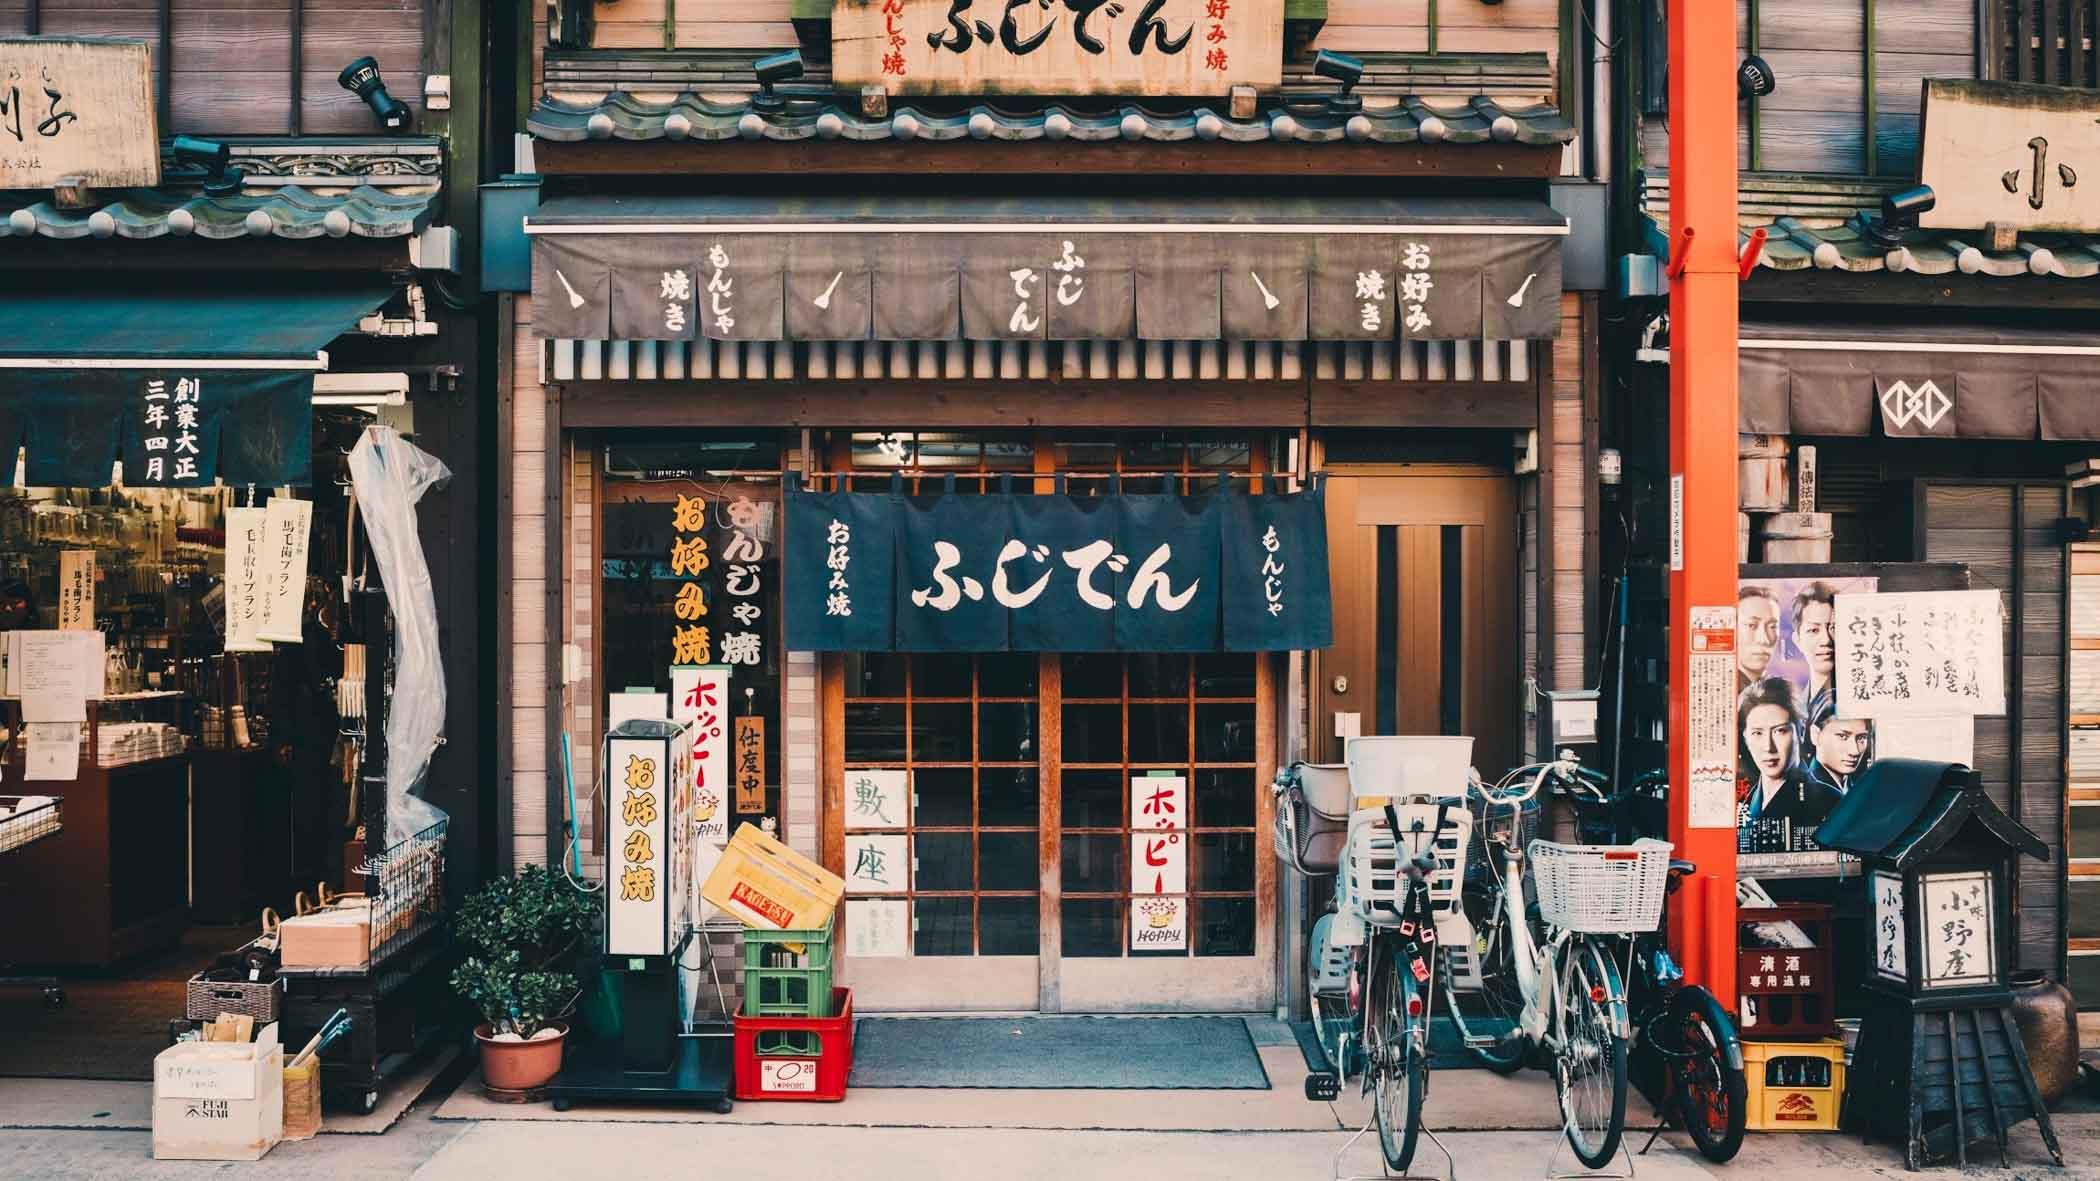 tibo-japan-clay-banks-170882-unsplash.jp